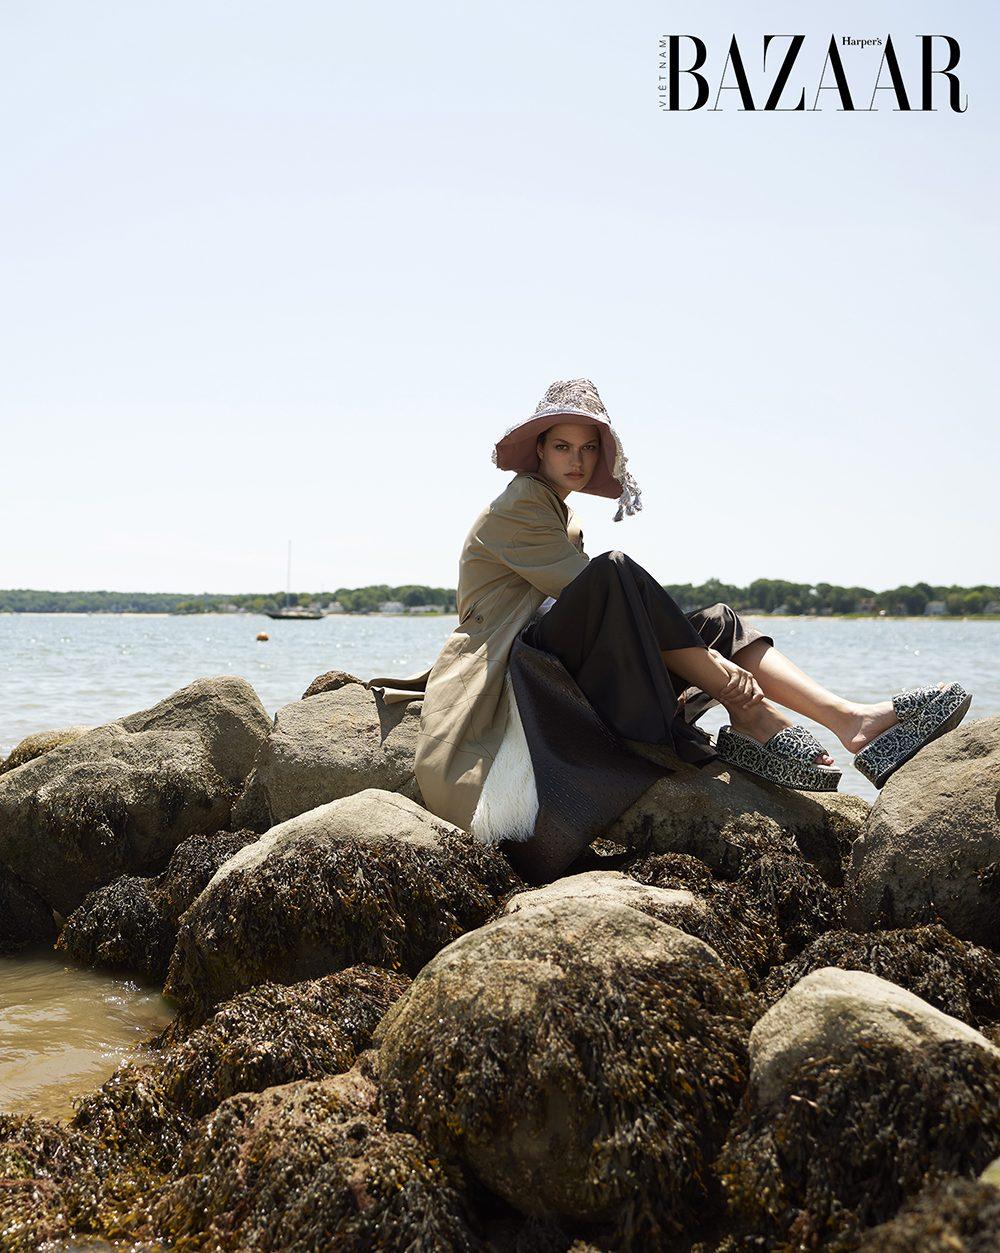 bộ ảnh Đất Mẹ do Daniele Carettoni sản xuất 2